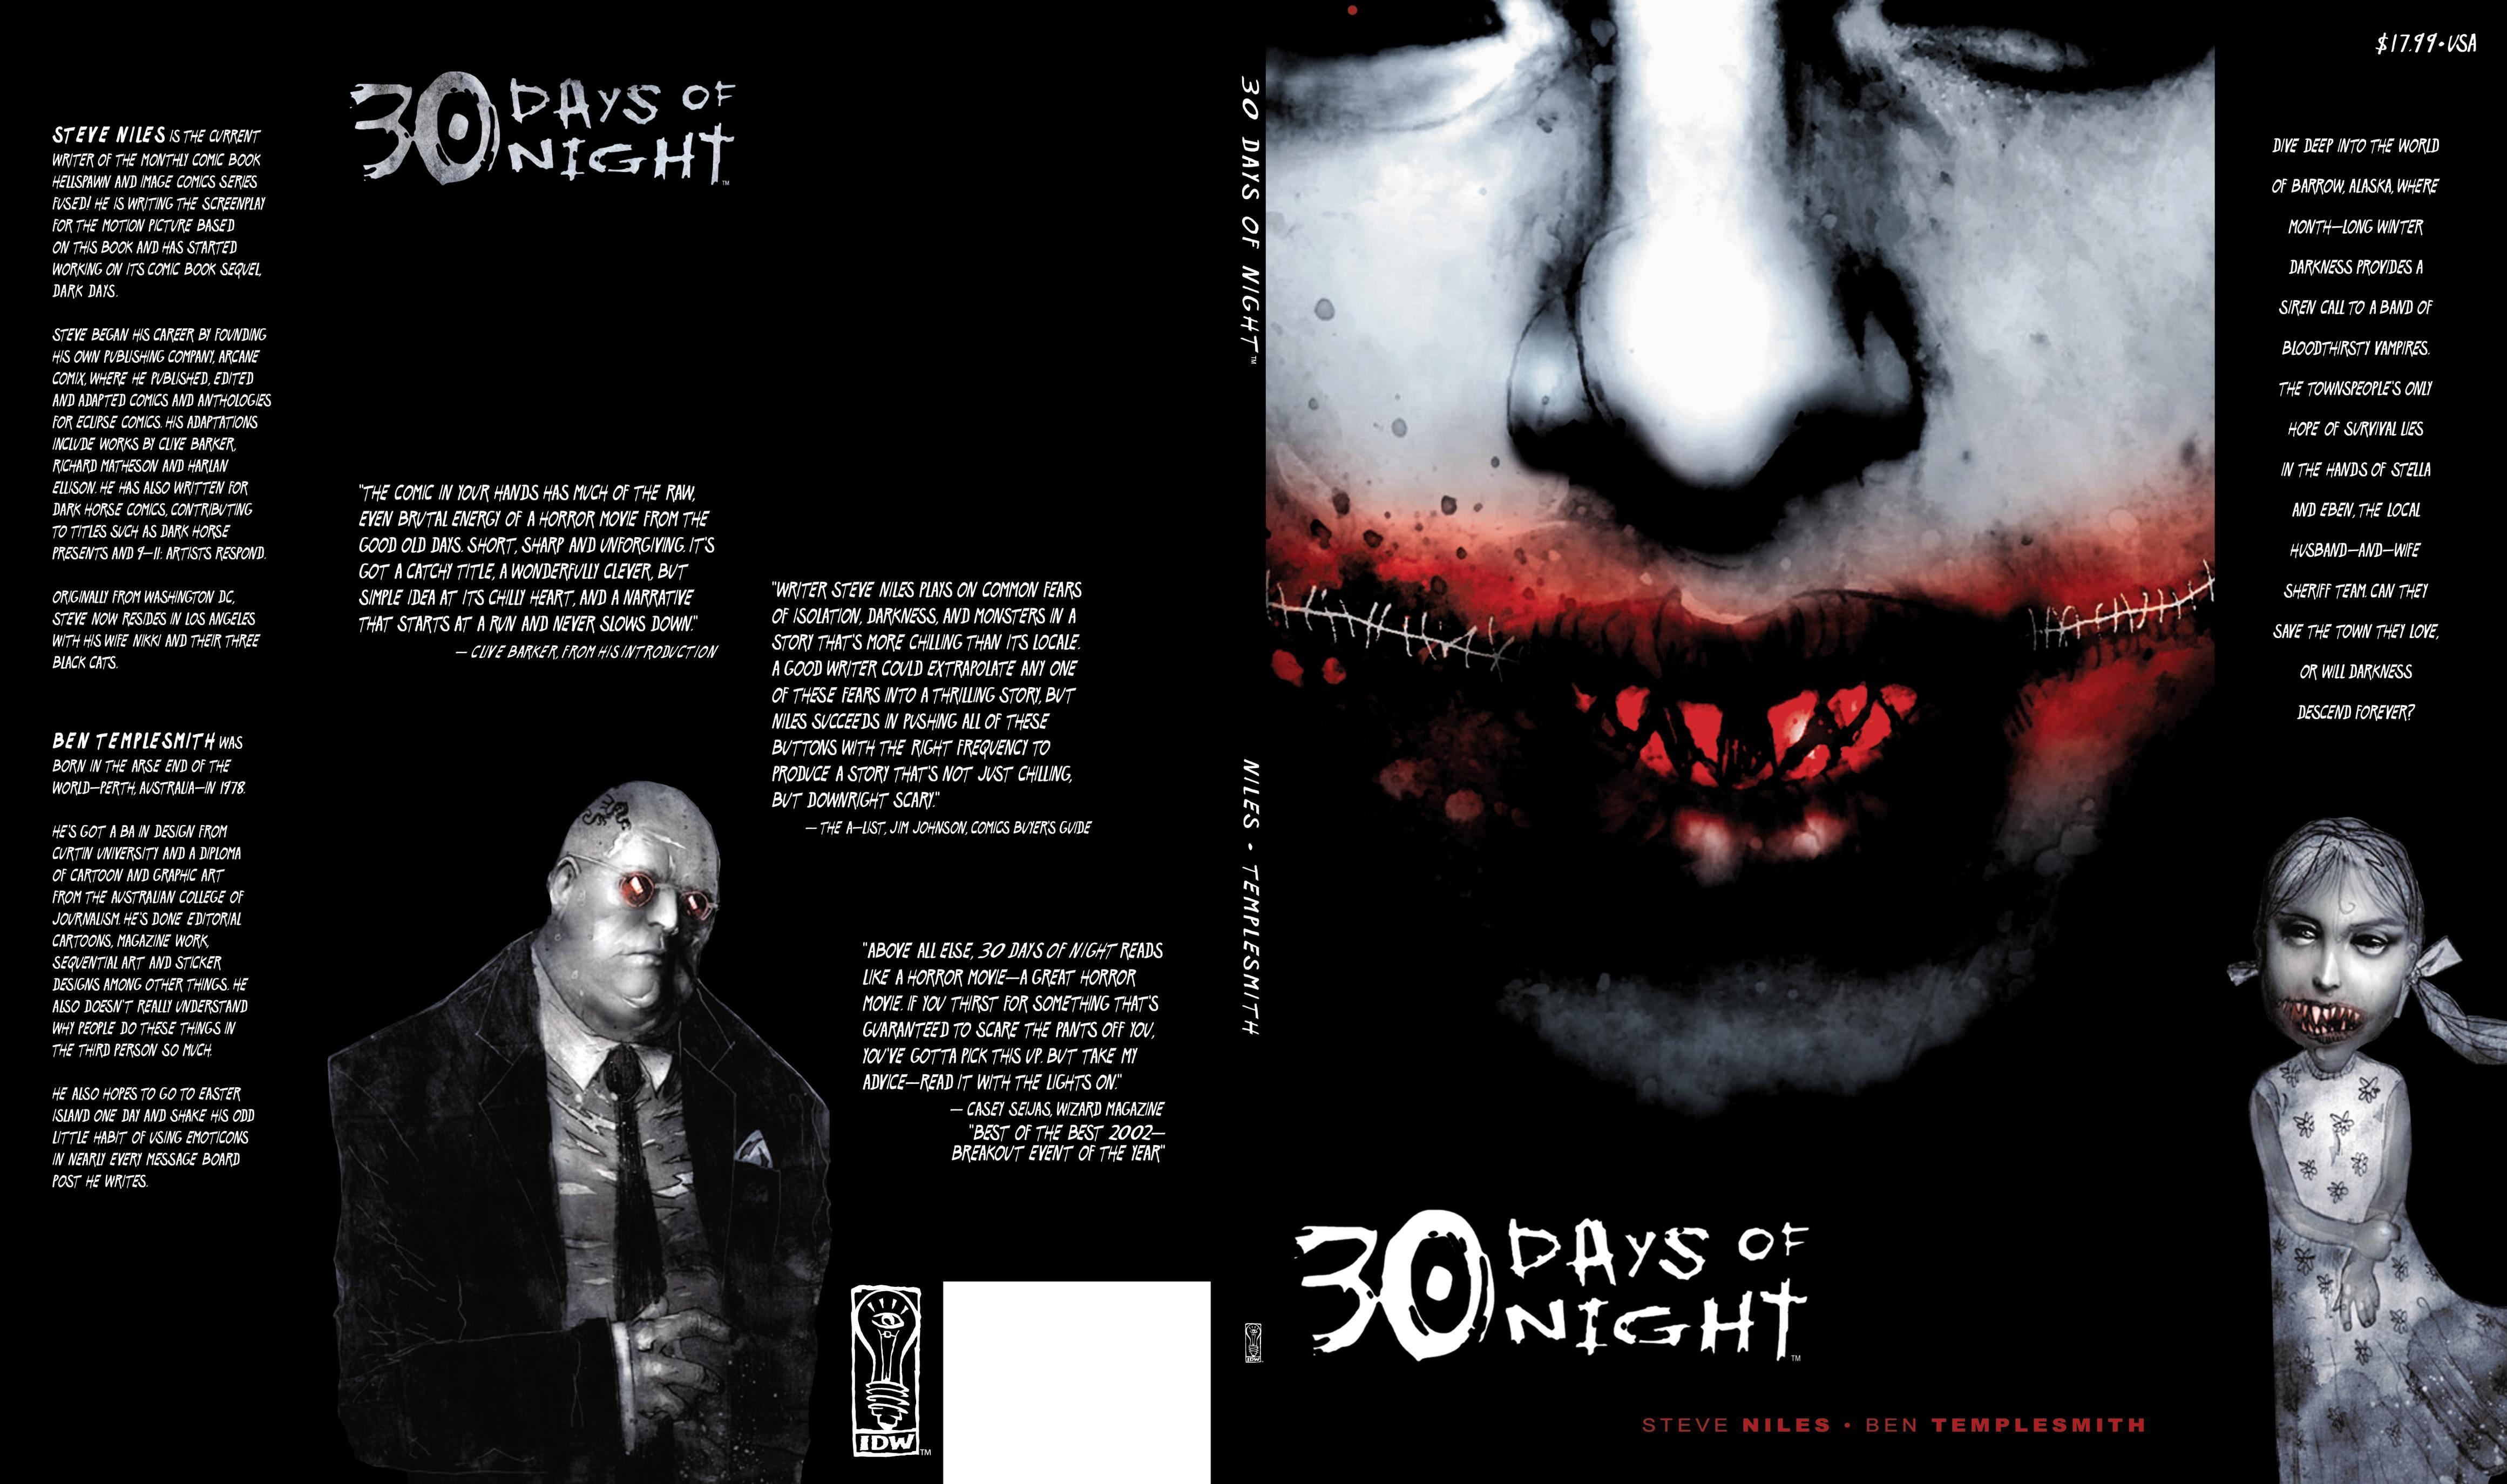 30 Days of Night 2003 digital